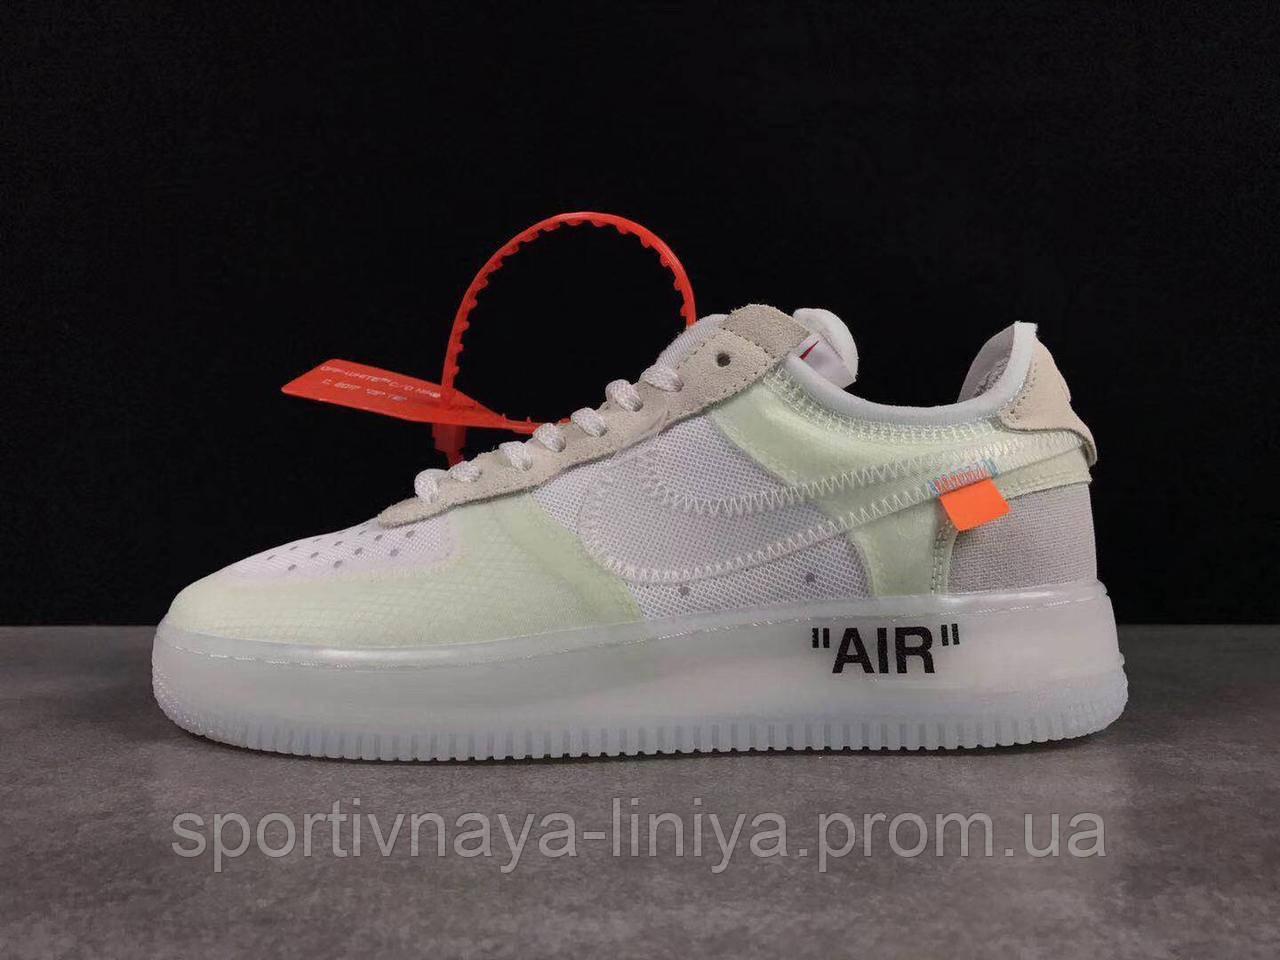 Кроссовки мужские белые Nike Air Force 1 Low OFF WHITE (реплика)